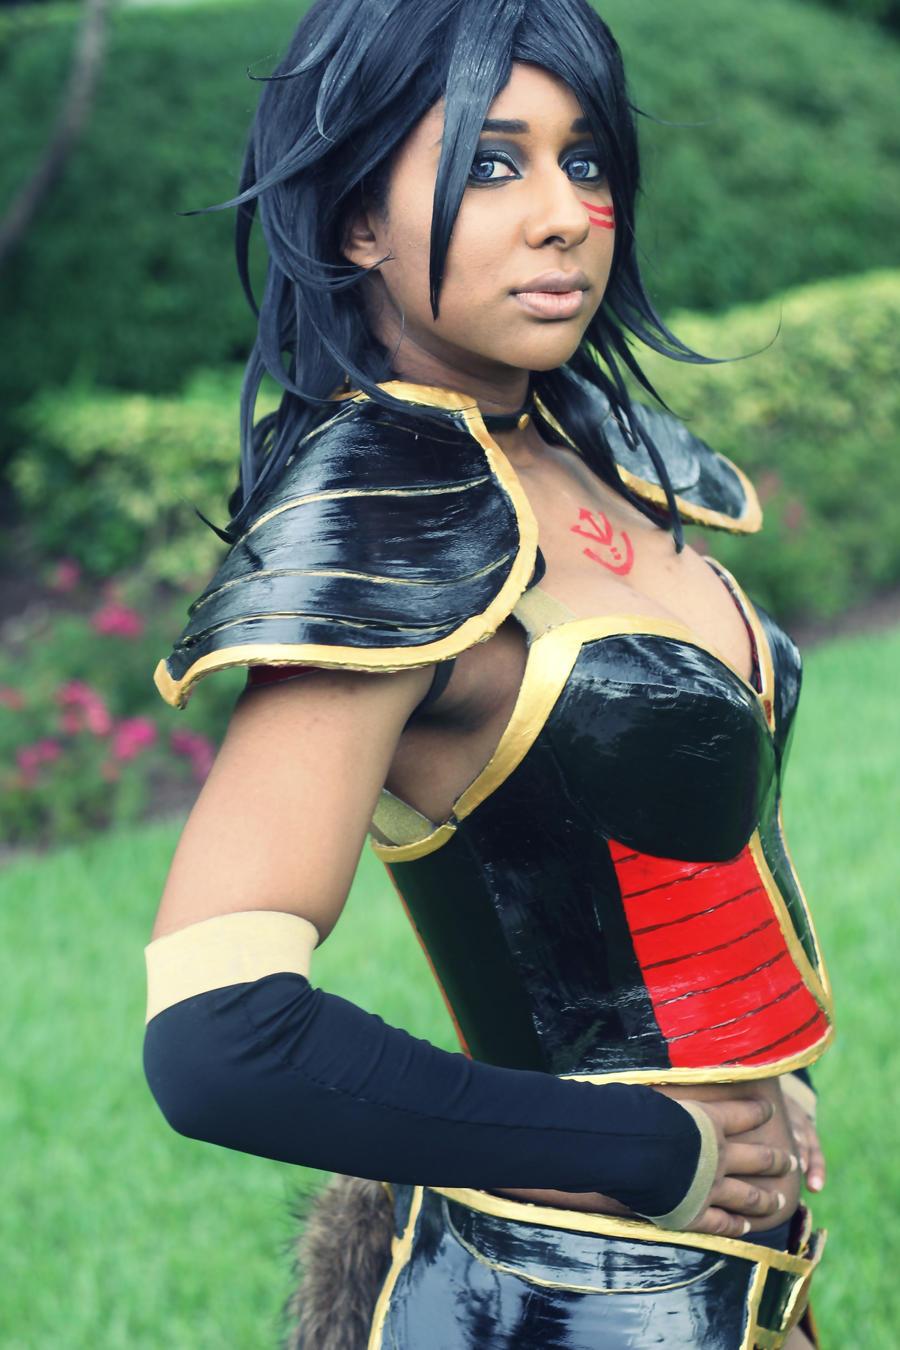 FL Supercon 2014: DragonBall Z Cosplay (Azuki) by MakeupSiren